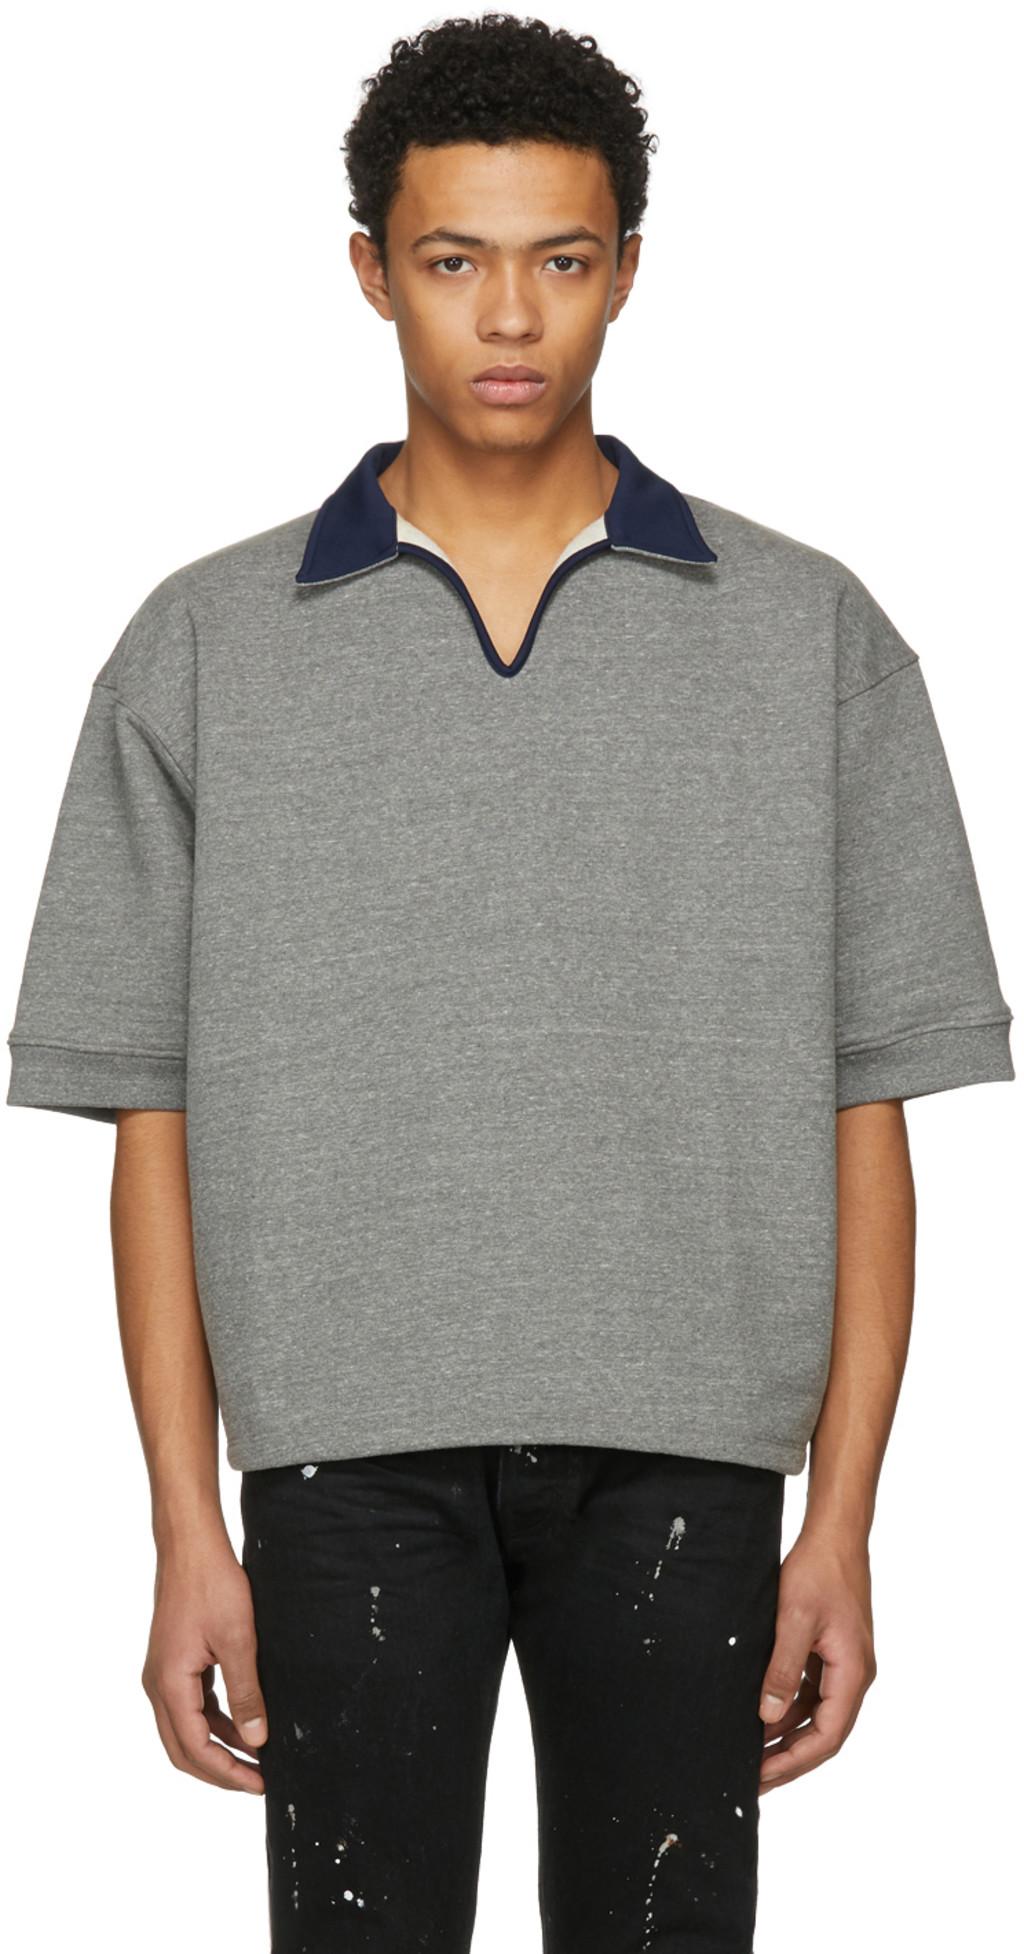 Online Store Cheap Price Store Mens Denim Oversized Shirt Fear of God 9YXNIMlrd